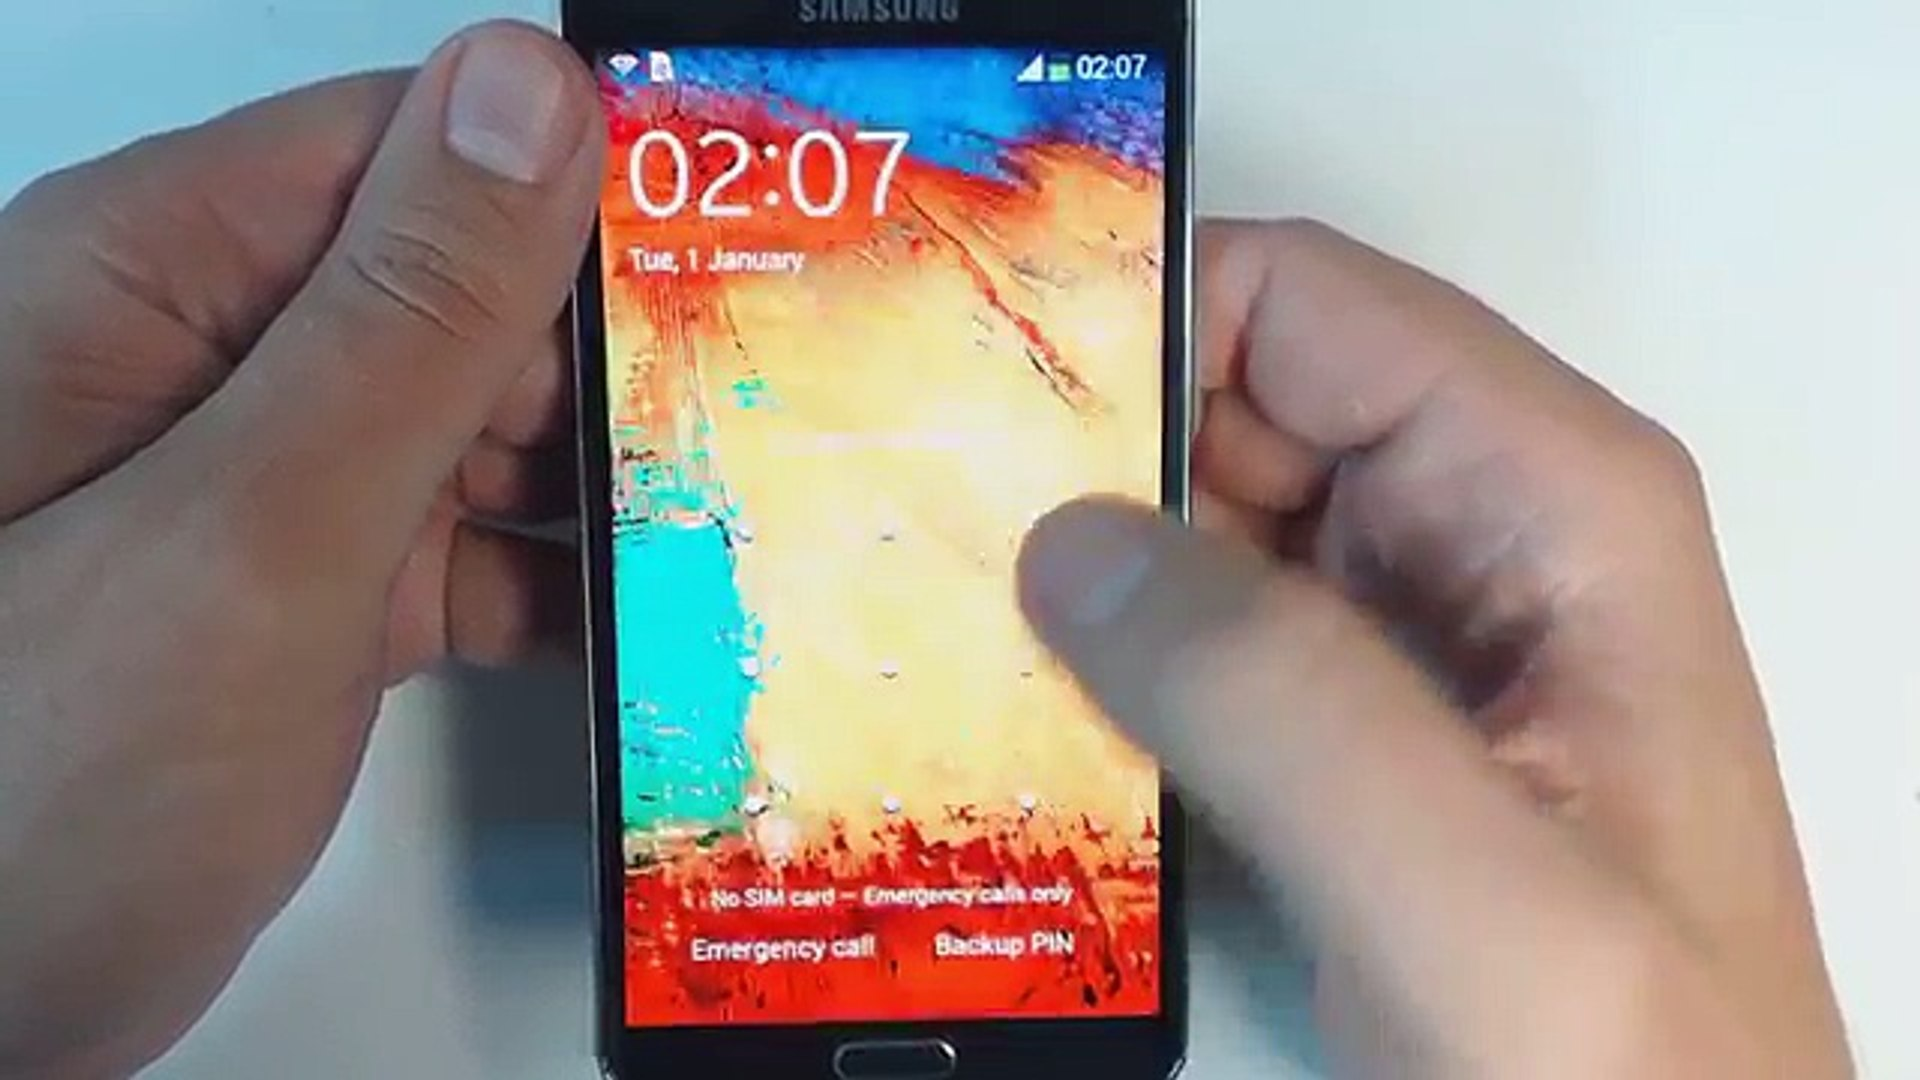 Samsung Galaxy Note 3 N9005 hard reset